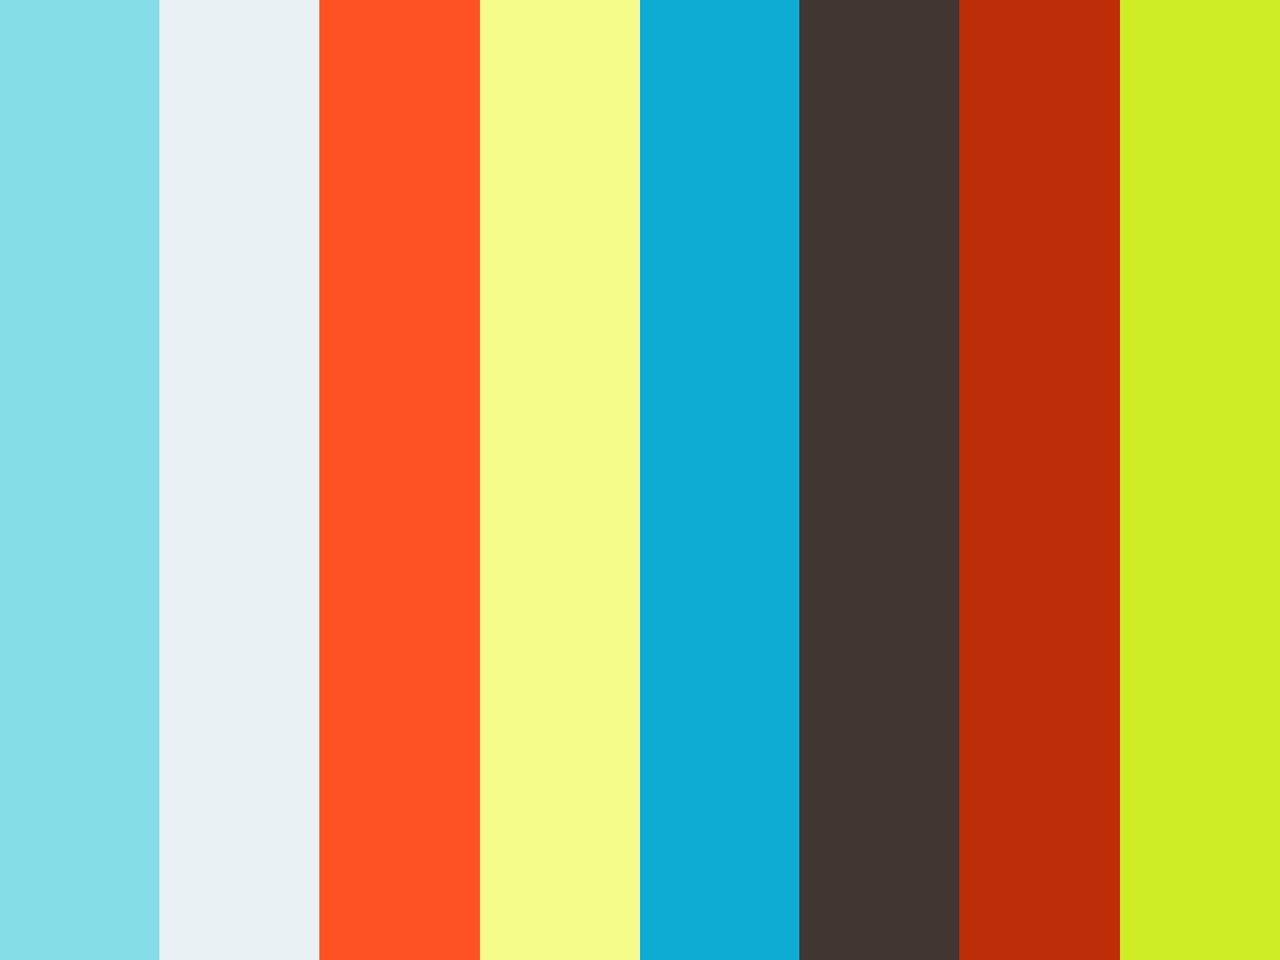 Eric Topol - Teaser